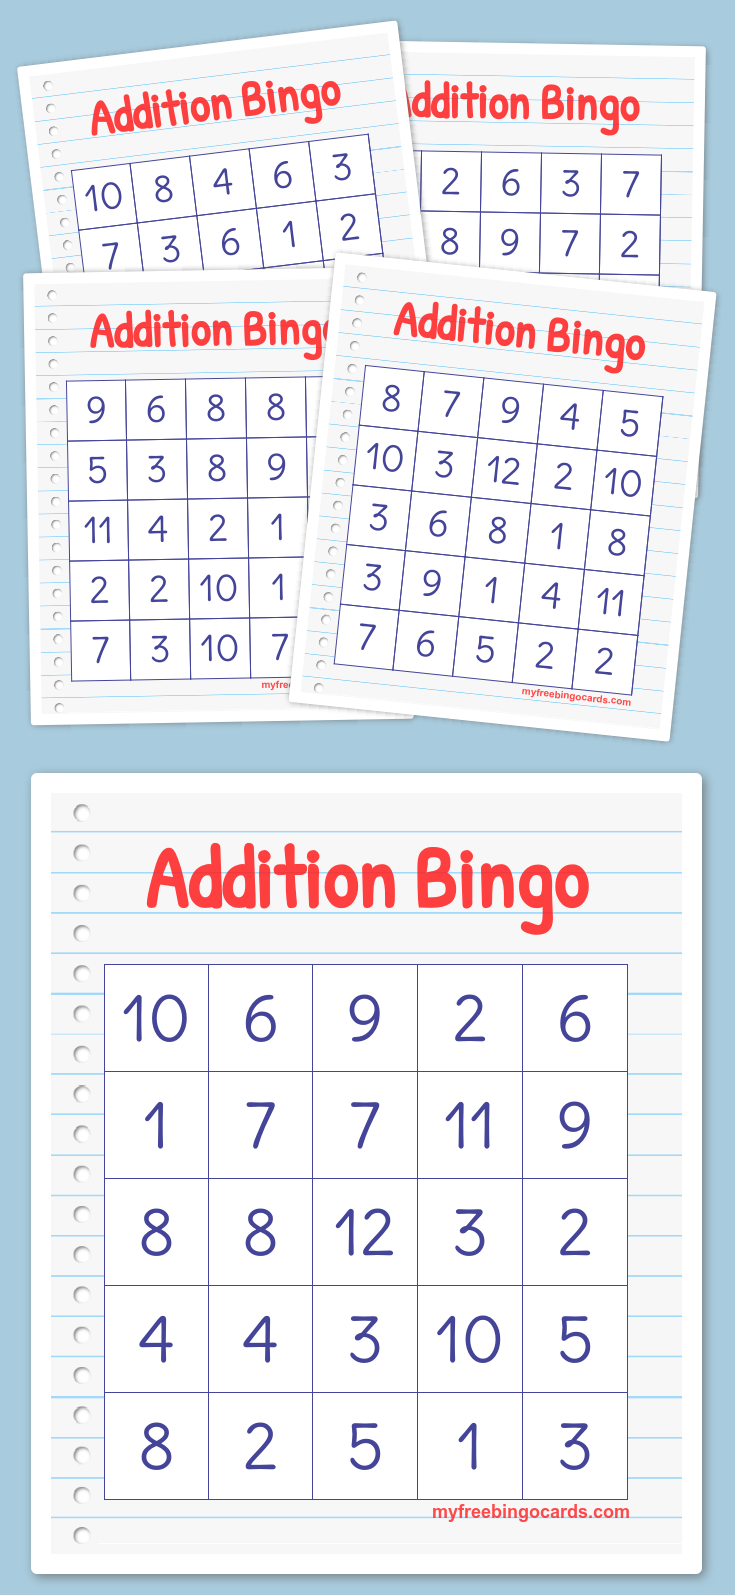 Addition Bingo Math Bingo Bingo Cards Printable Bingo Printable Free